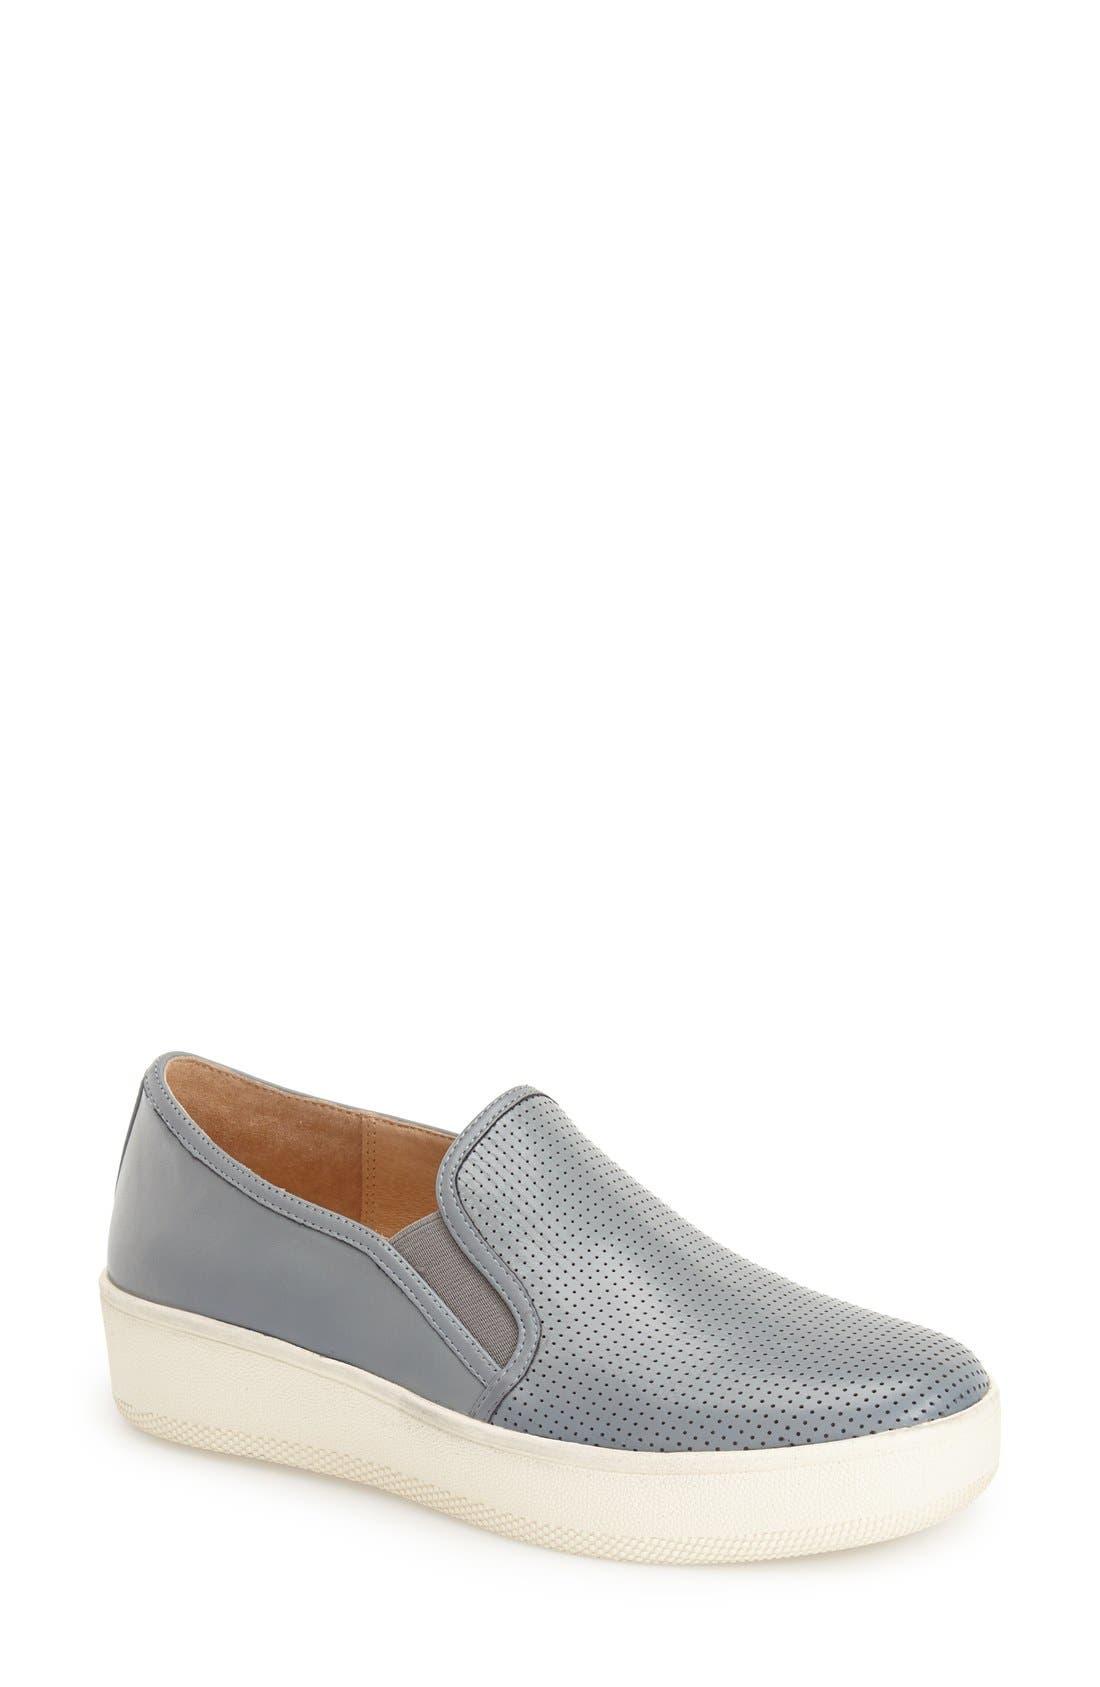 Main Image - JSlides 'Jibbie' Slip-On Platform Sneaker (Women)